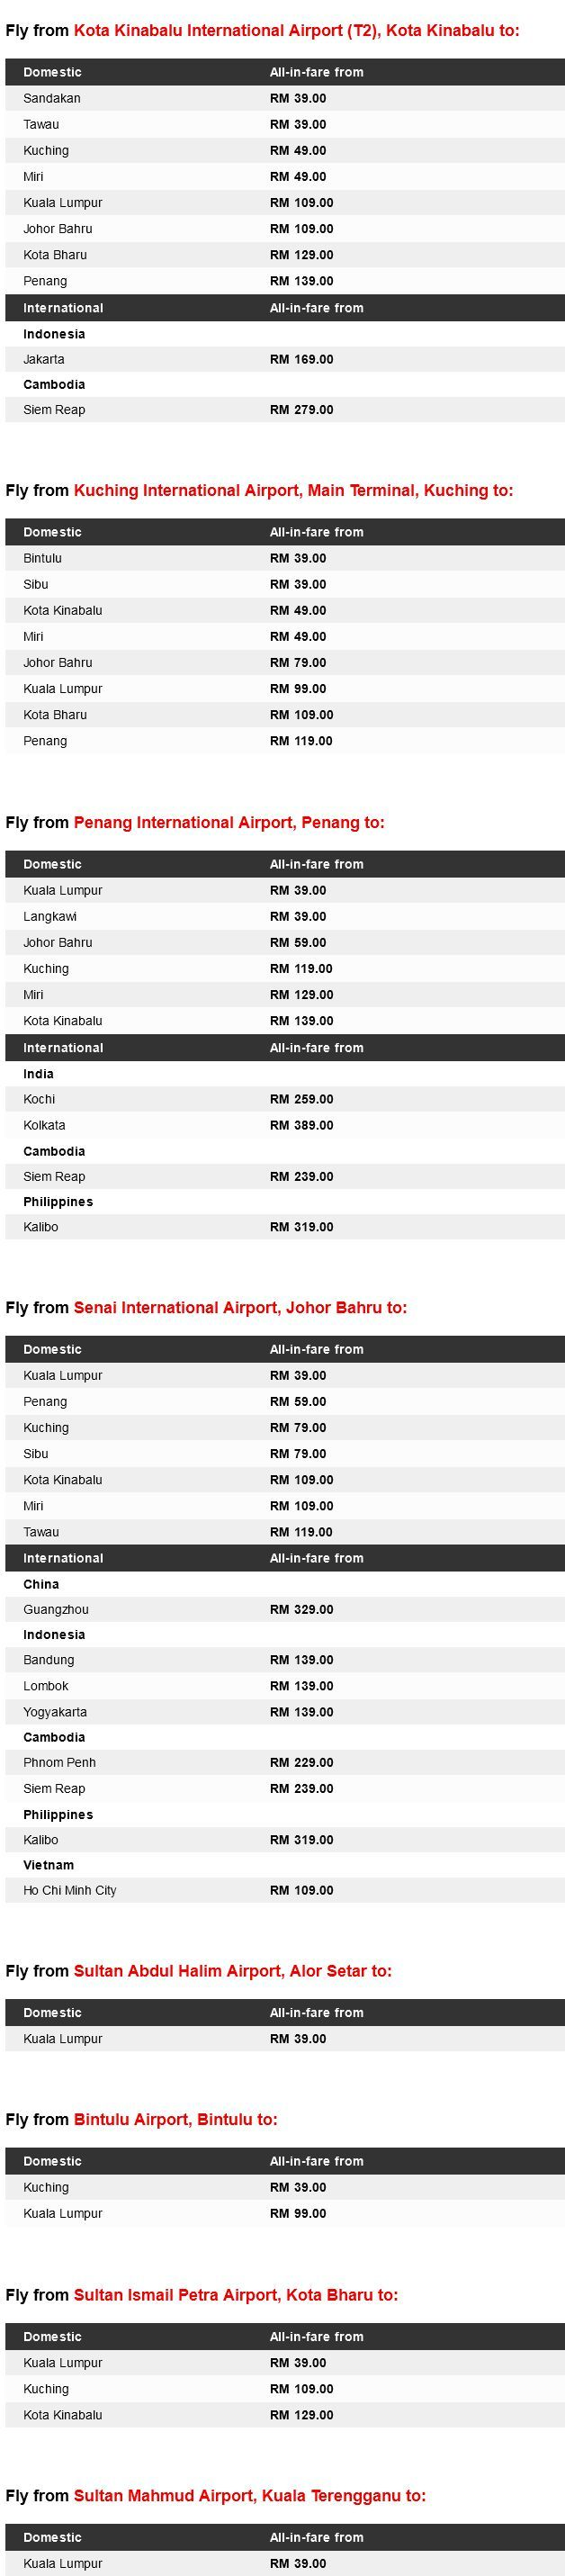 AirAsia Promotion Fares Details